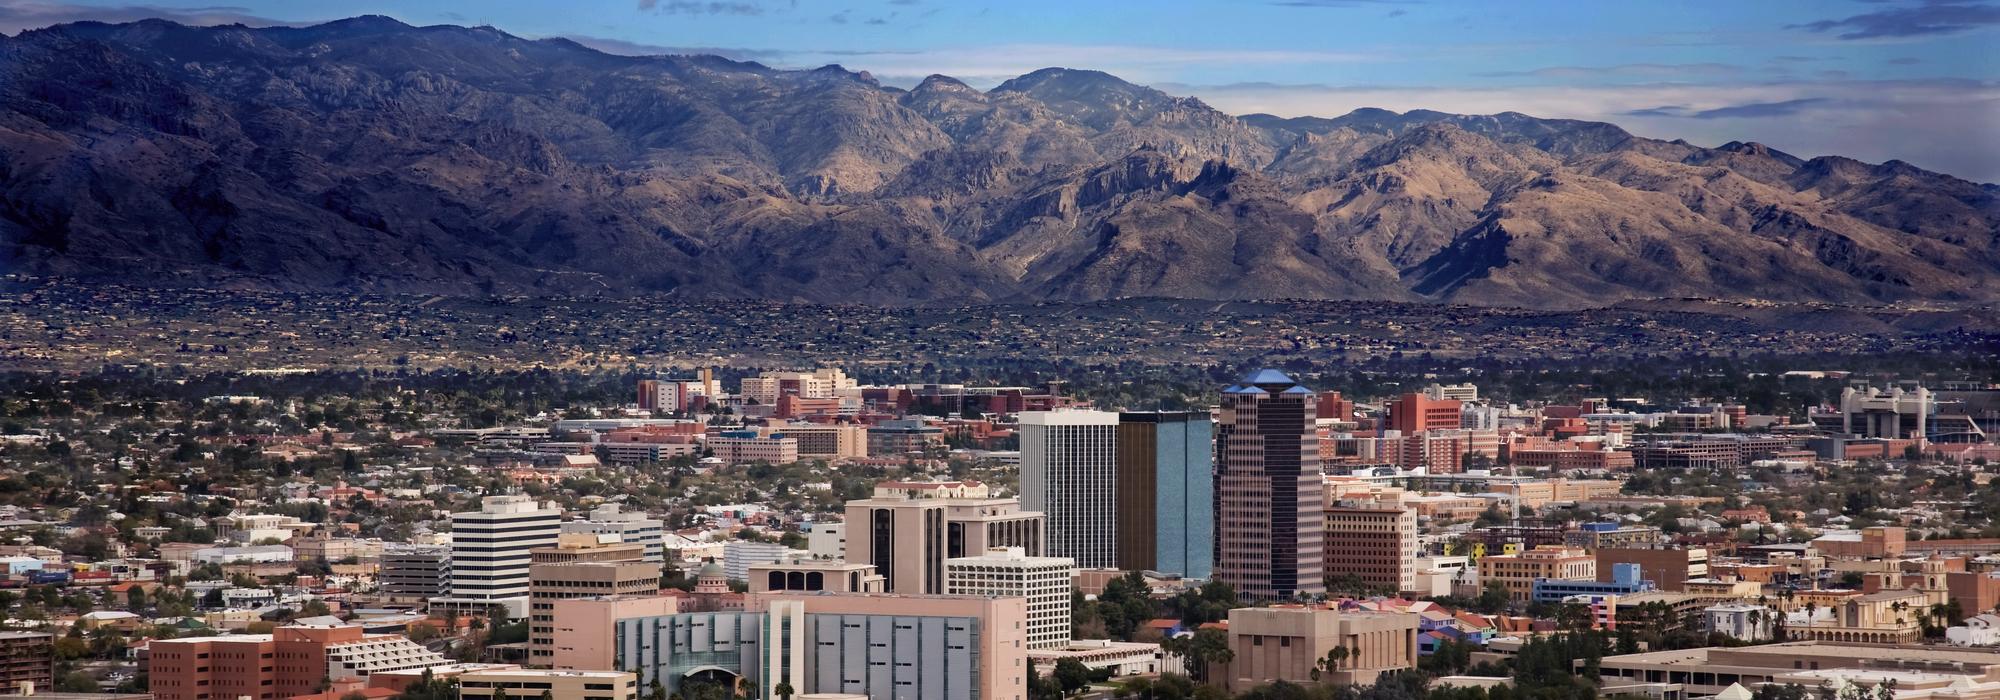 Amos Realty Services, Tucson, AZ slider (image)